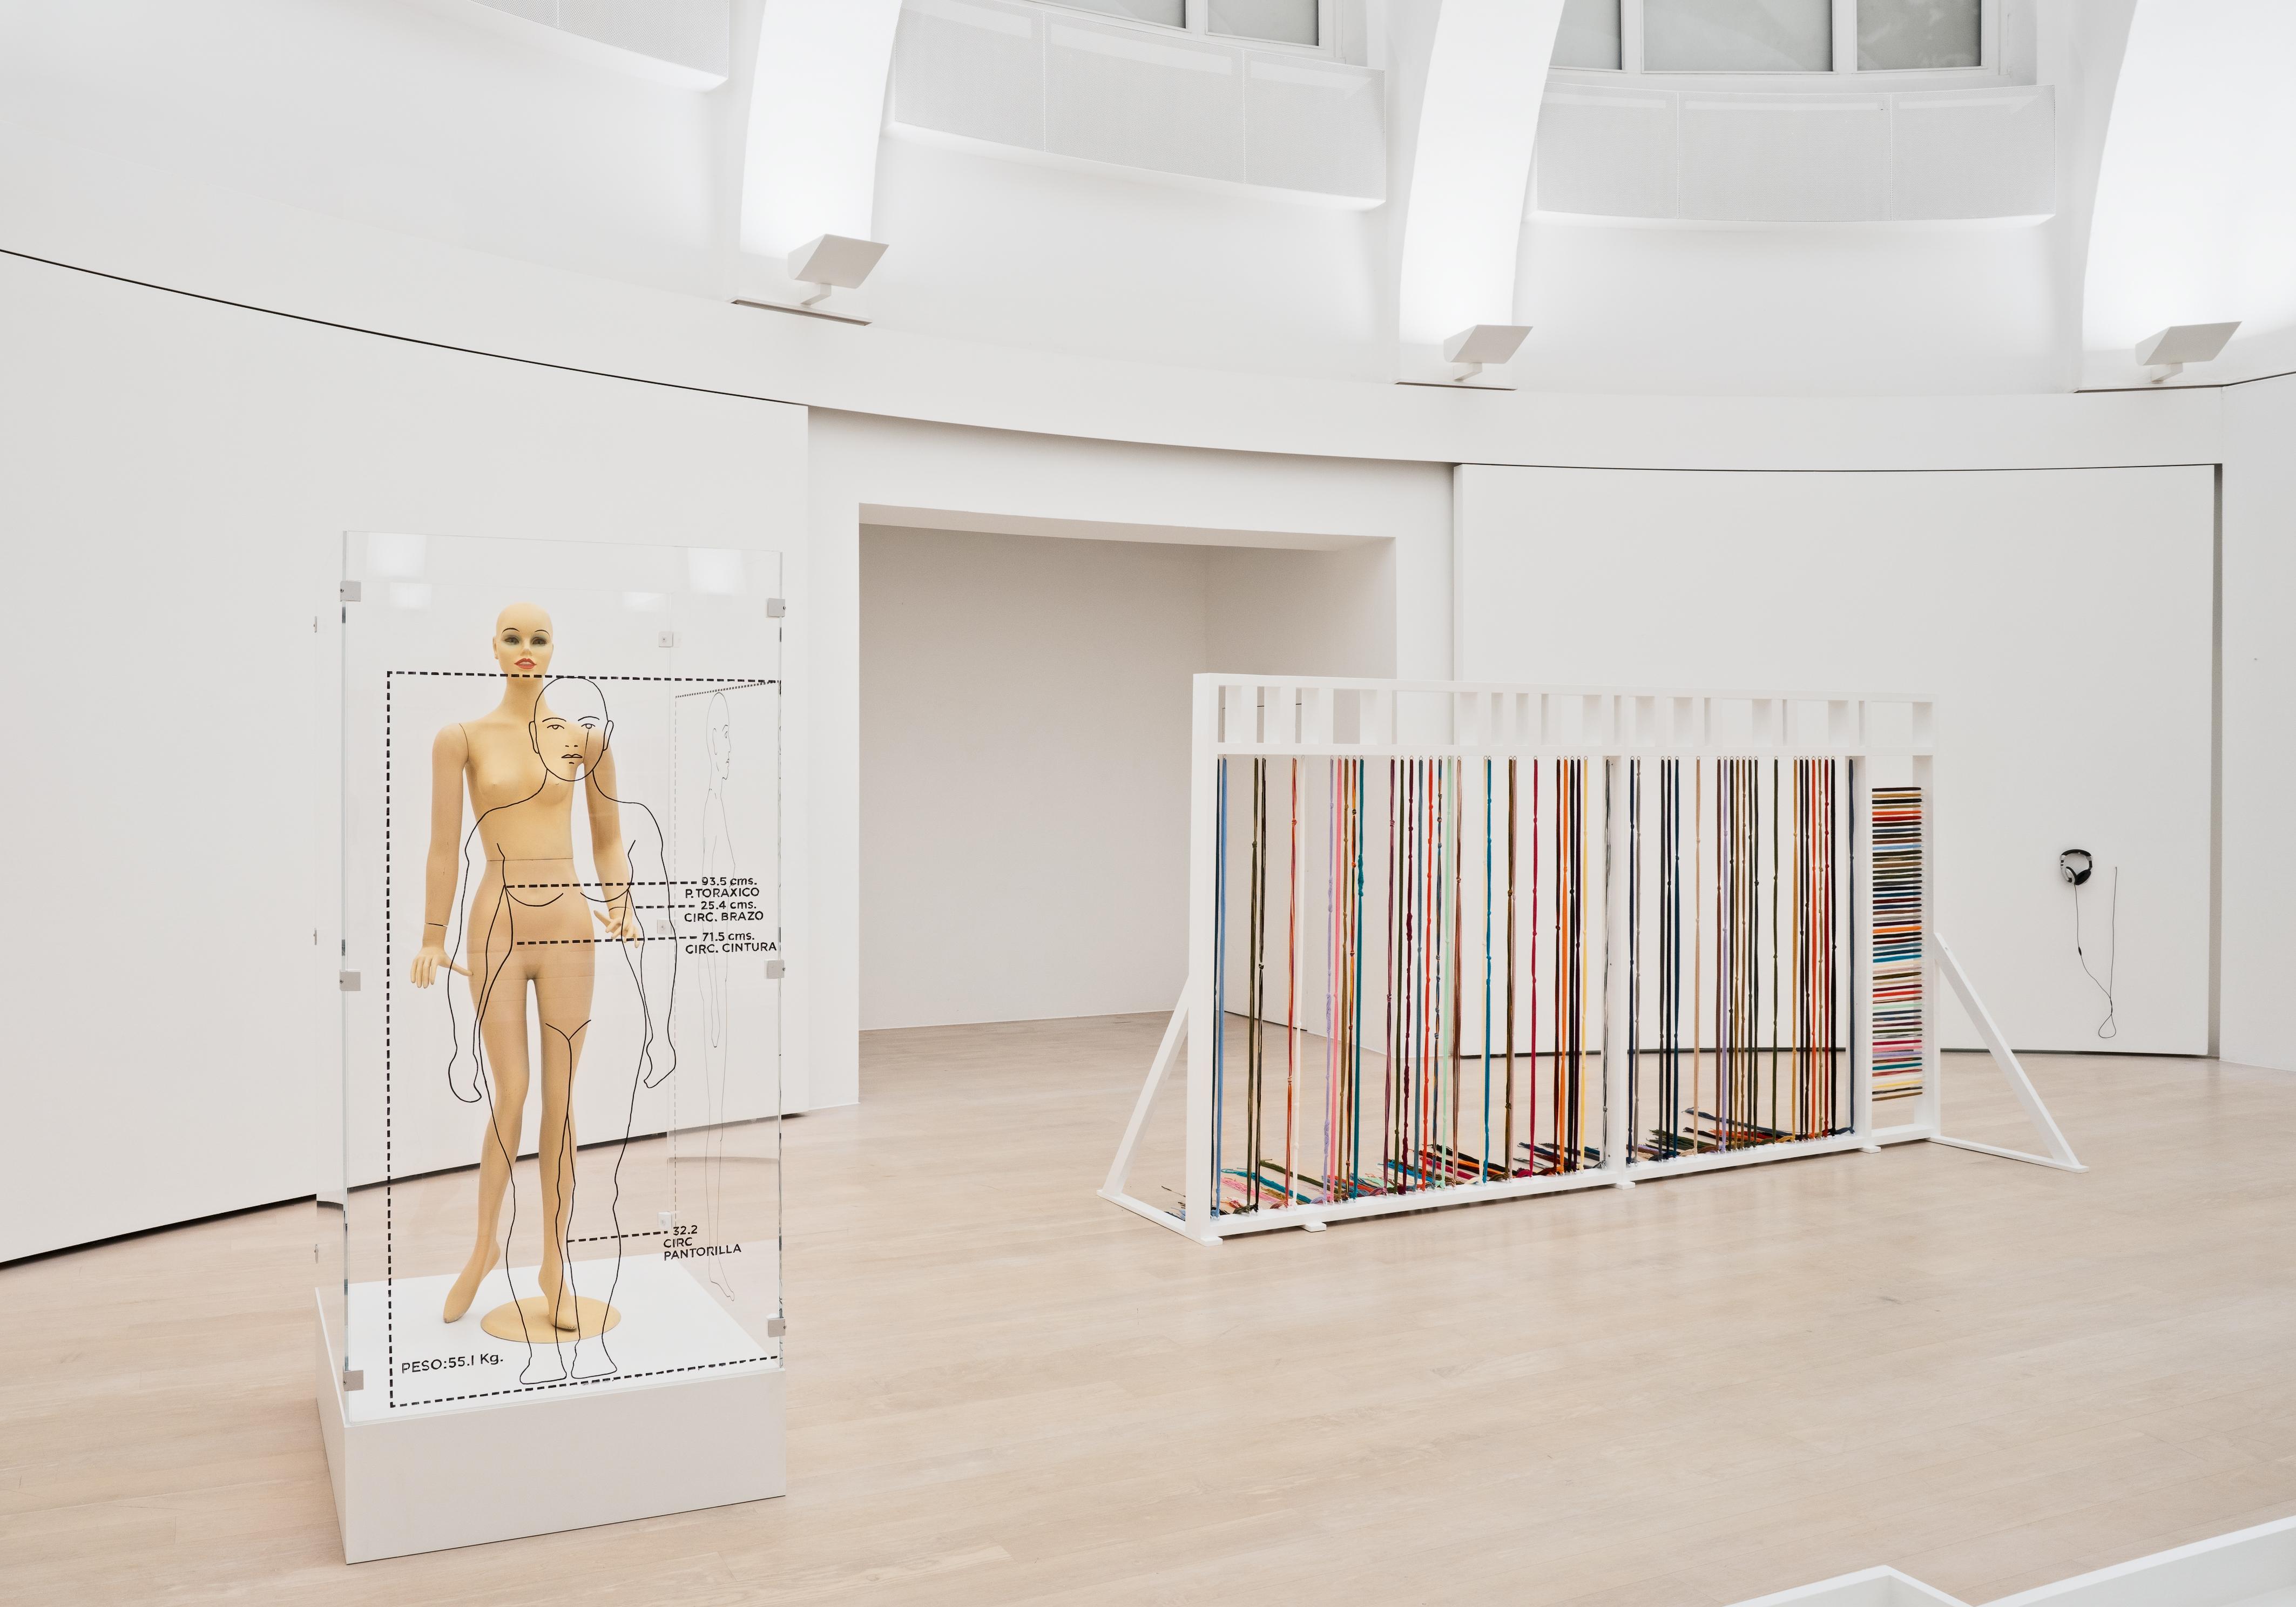 Galerie Barbara Thumm \ Teresa Burga – Aleatory Structures